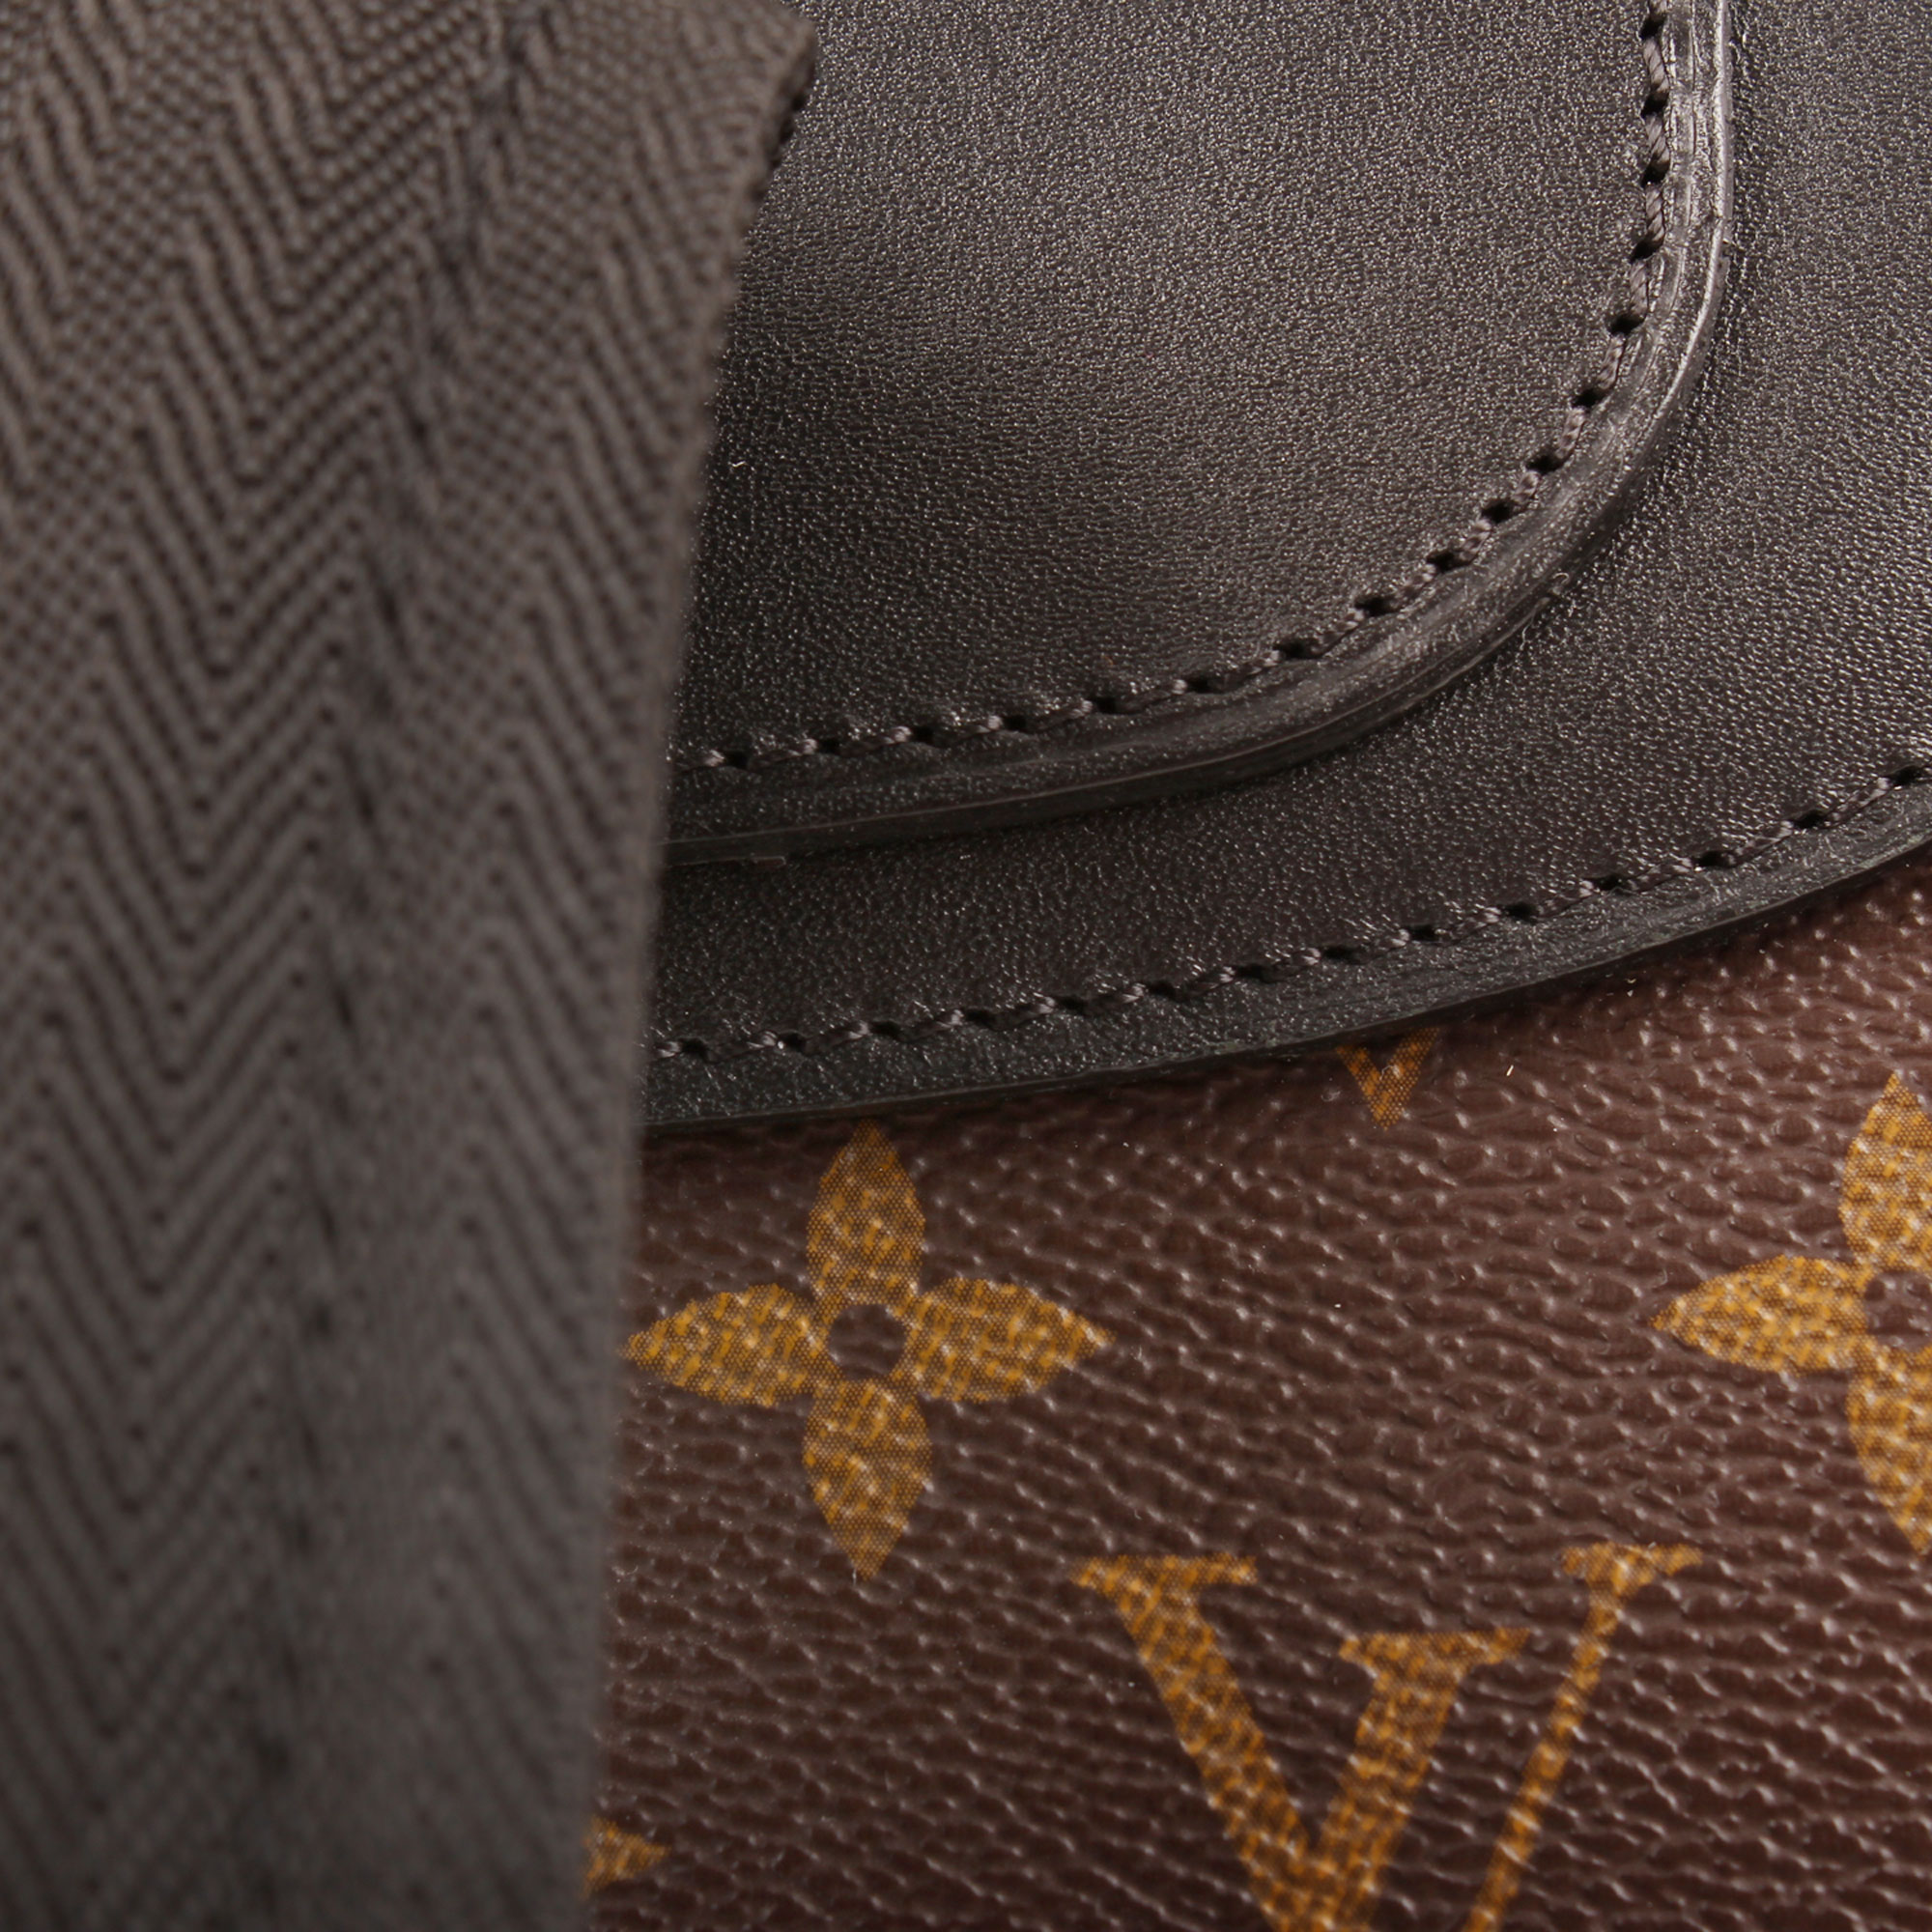 Leather image of louis vuitton palk monogram macassar backpack